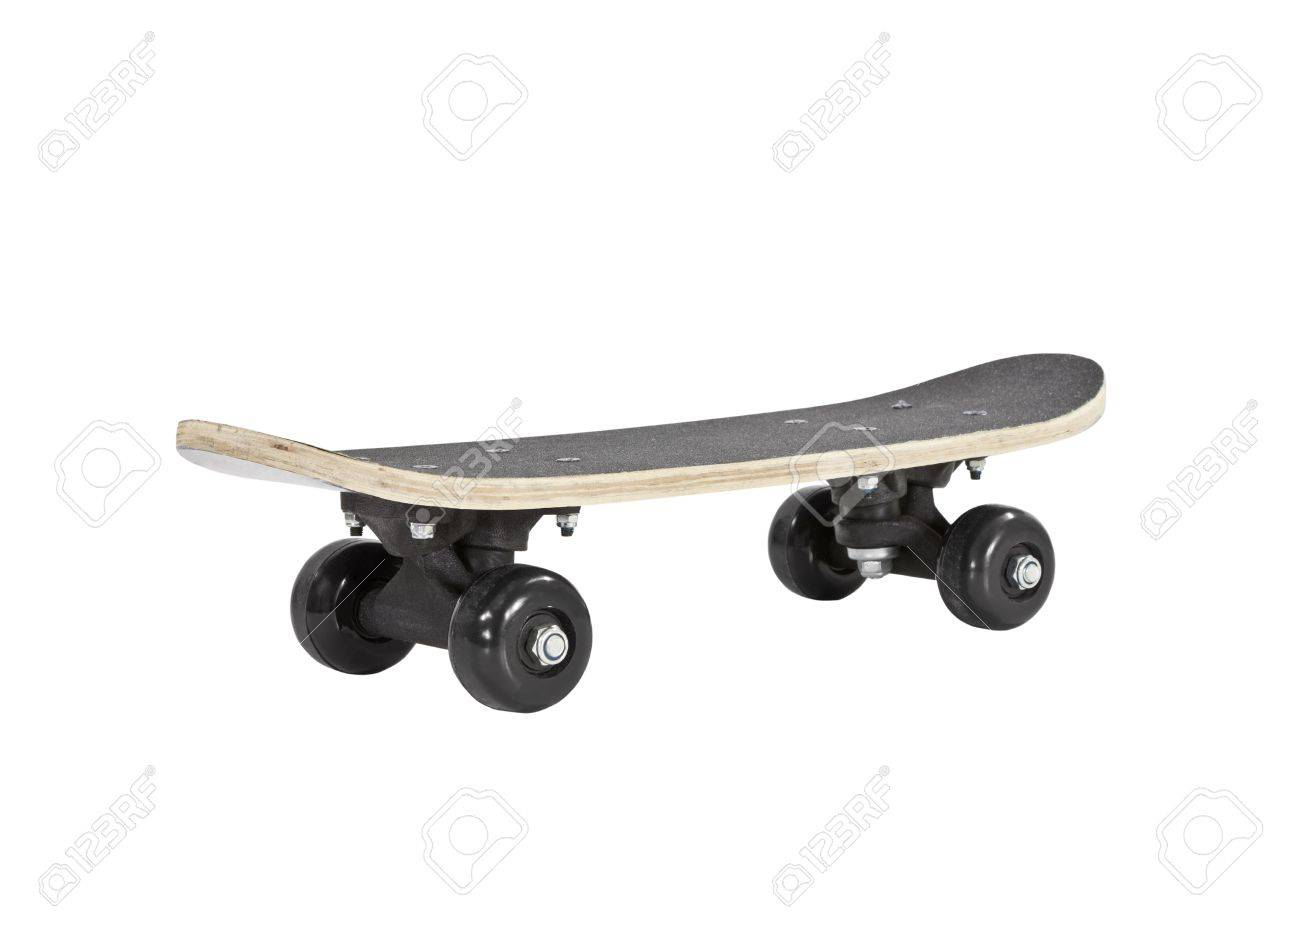 Toy skateboard isolated Stock Photo - 14732681